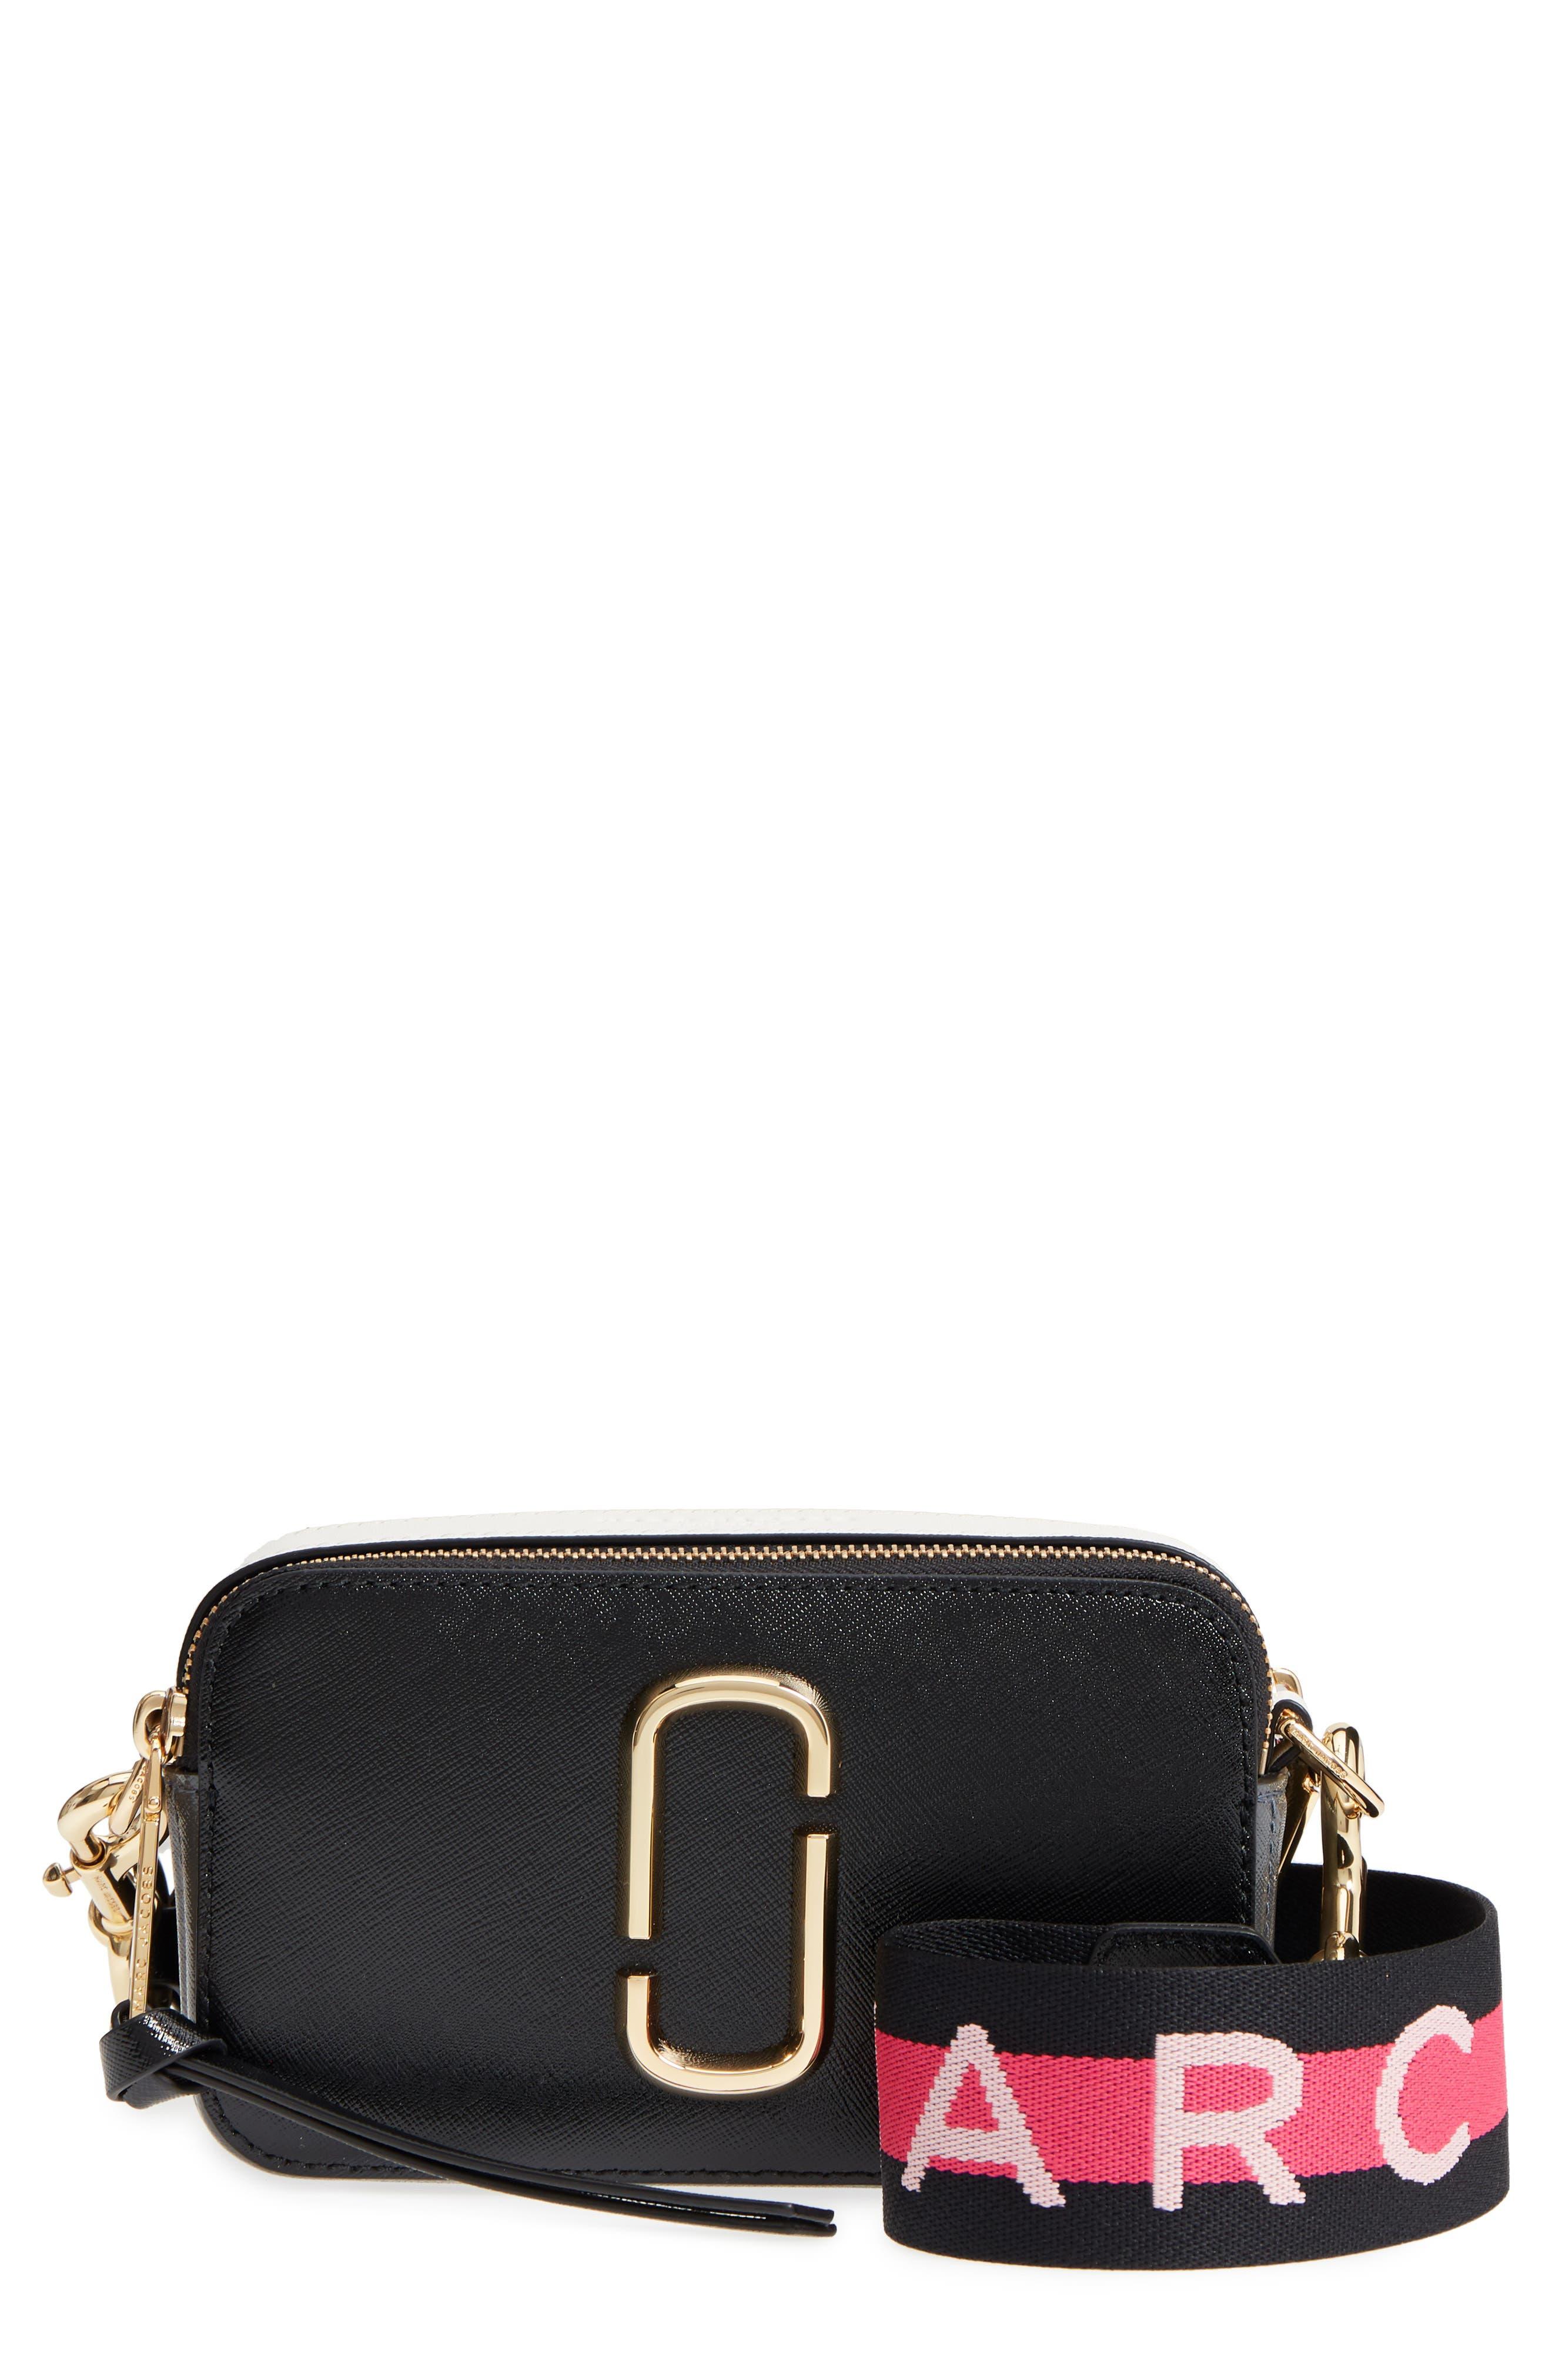 MARC JACOBS Snapshot Crossbody Bag, Main, color, BLACK MULTI